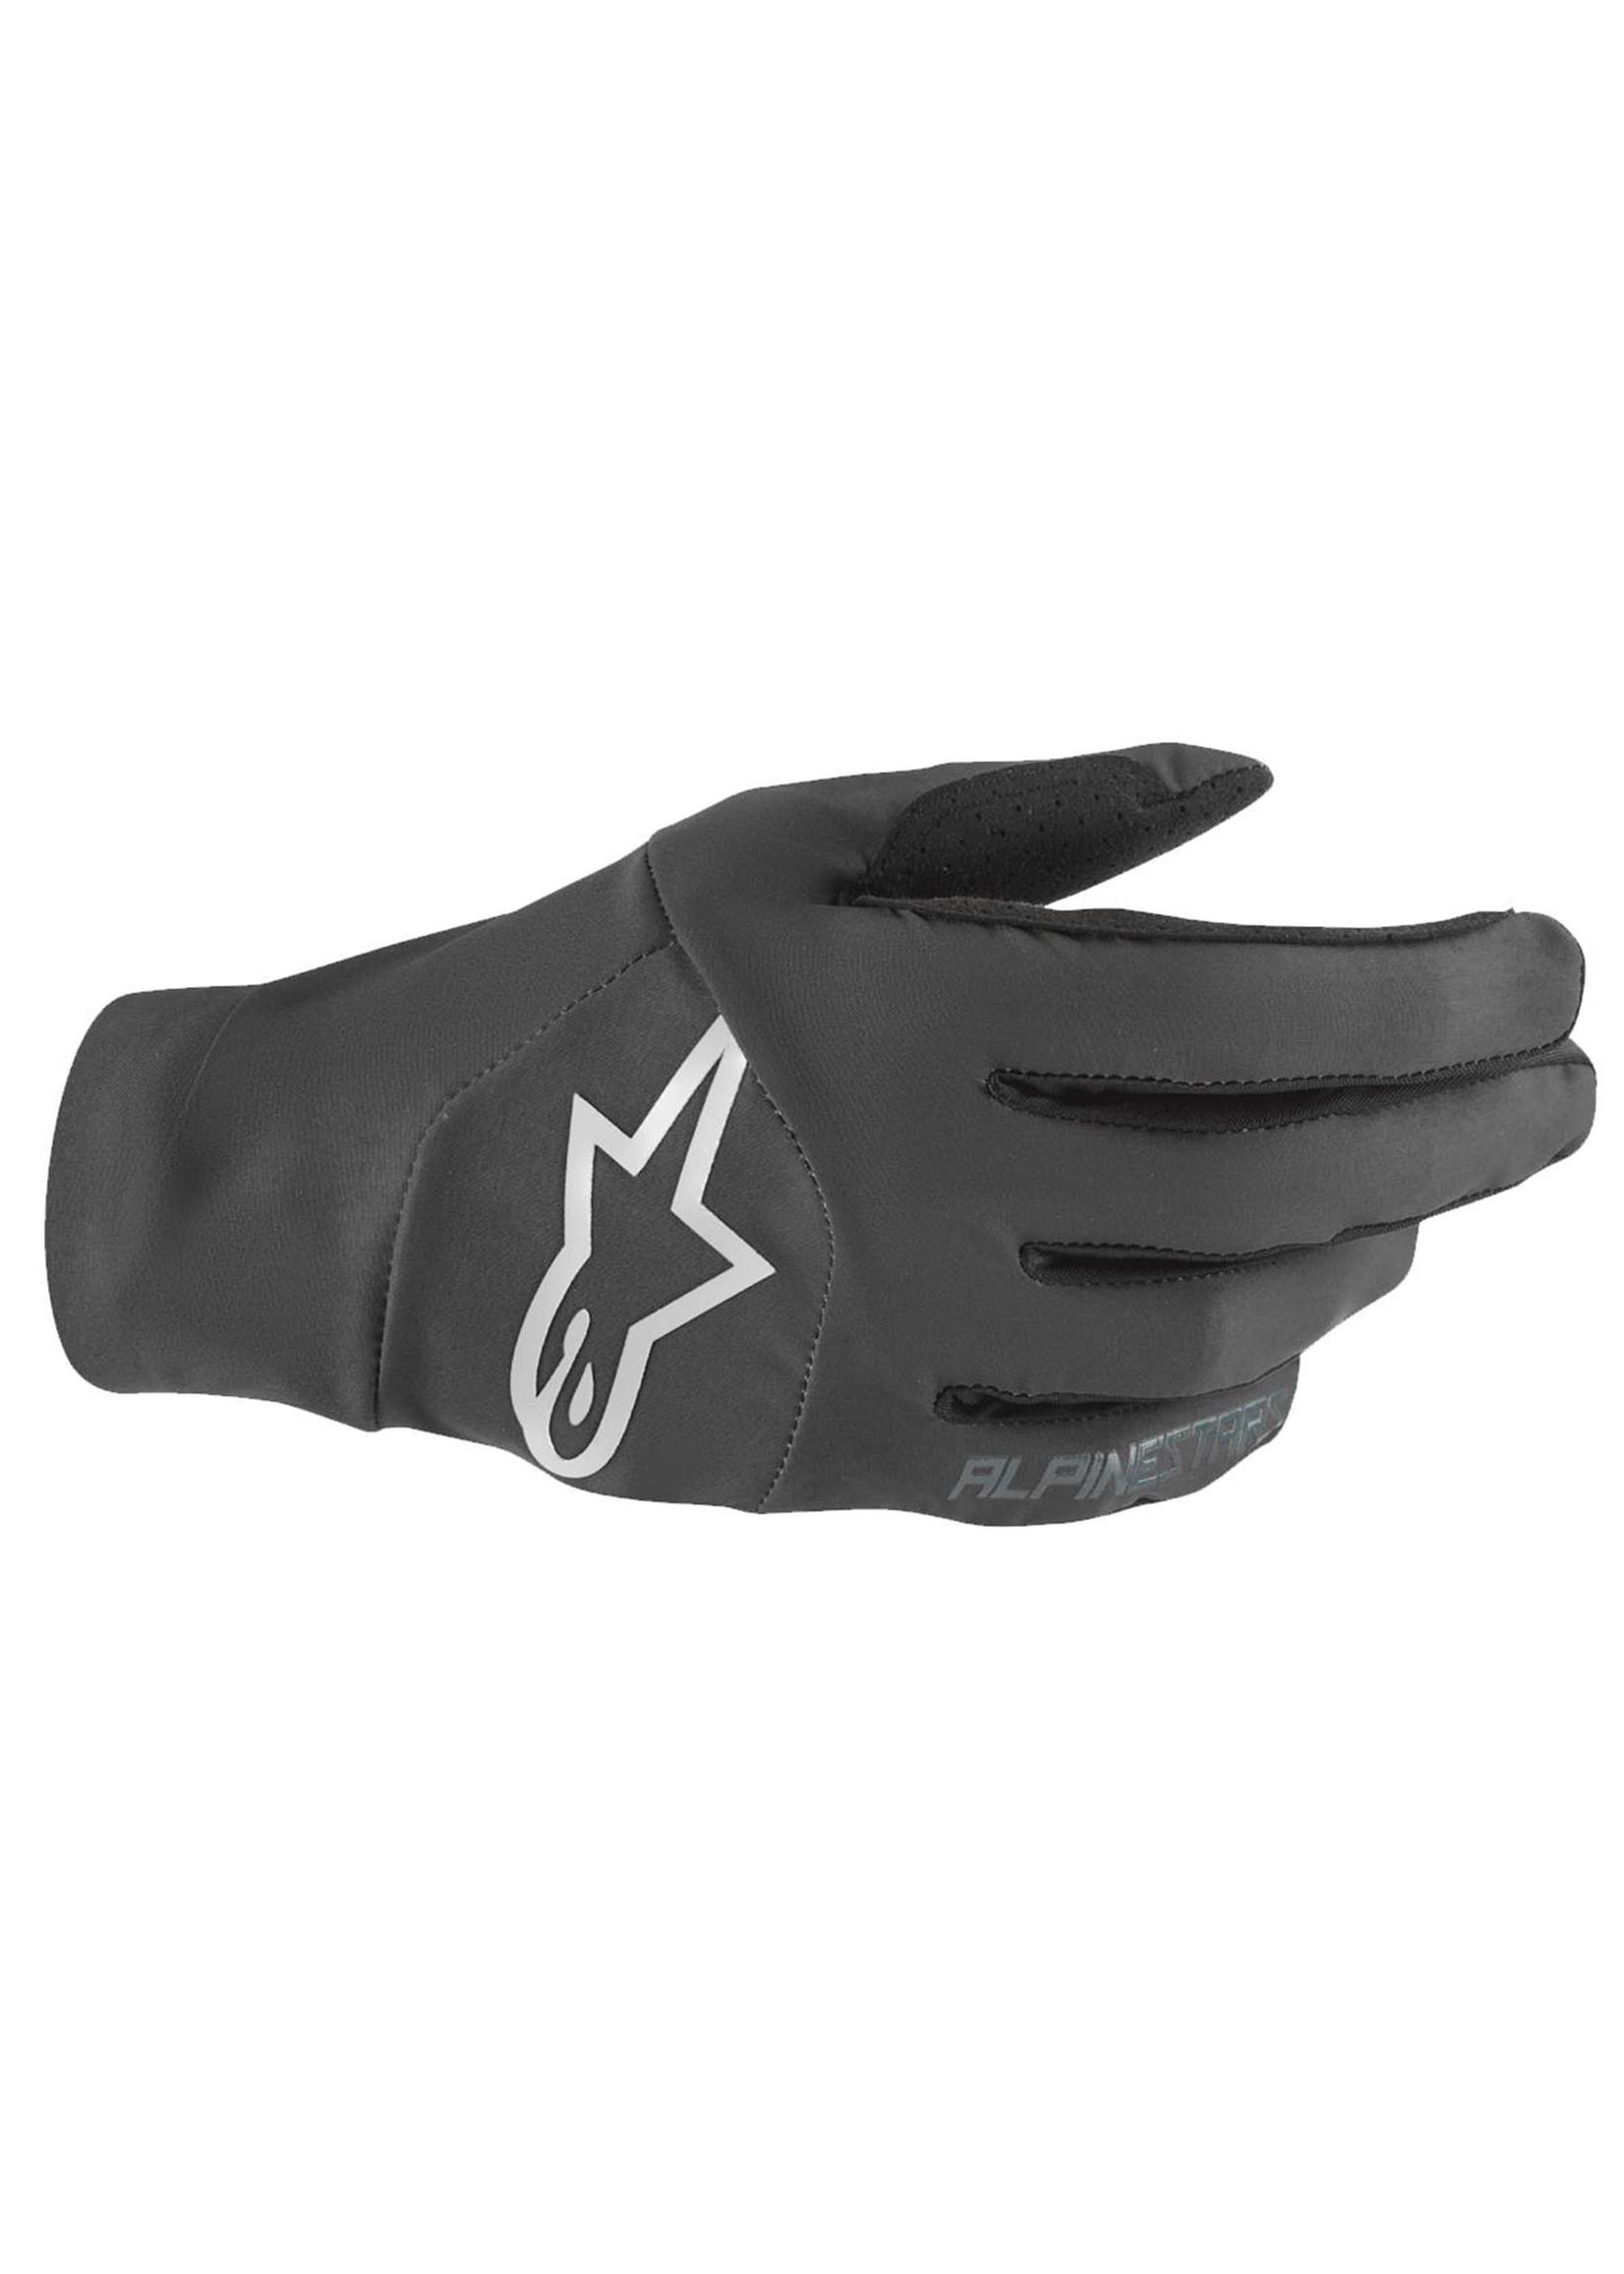 Alpinestars Alpinestars Drop 4.0 Glove